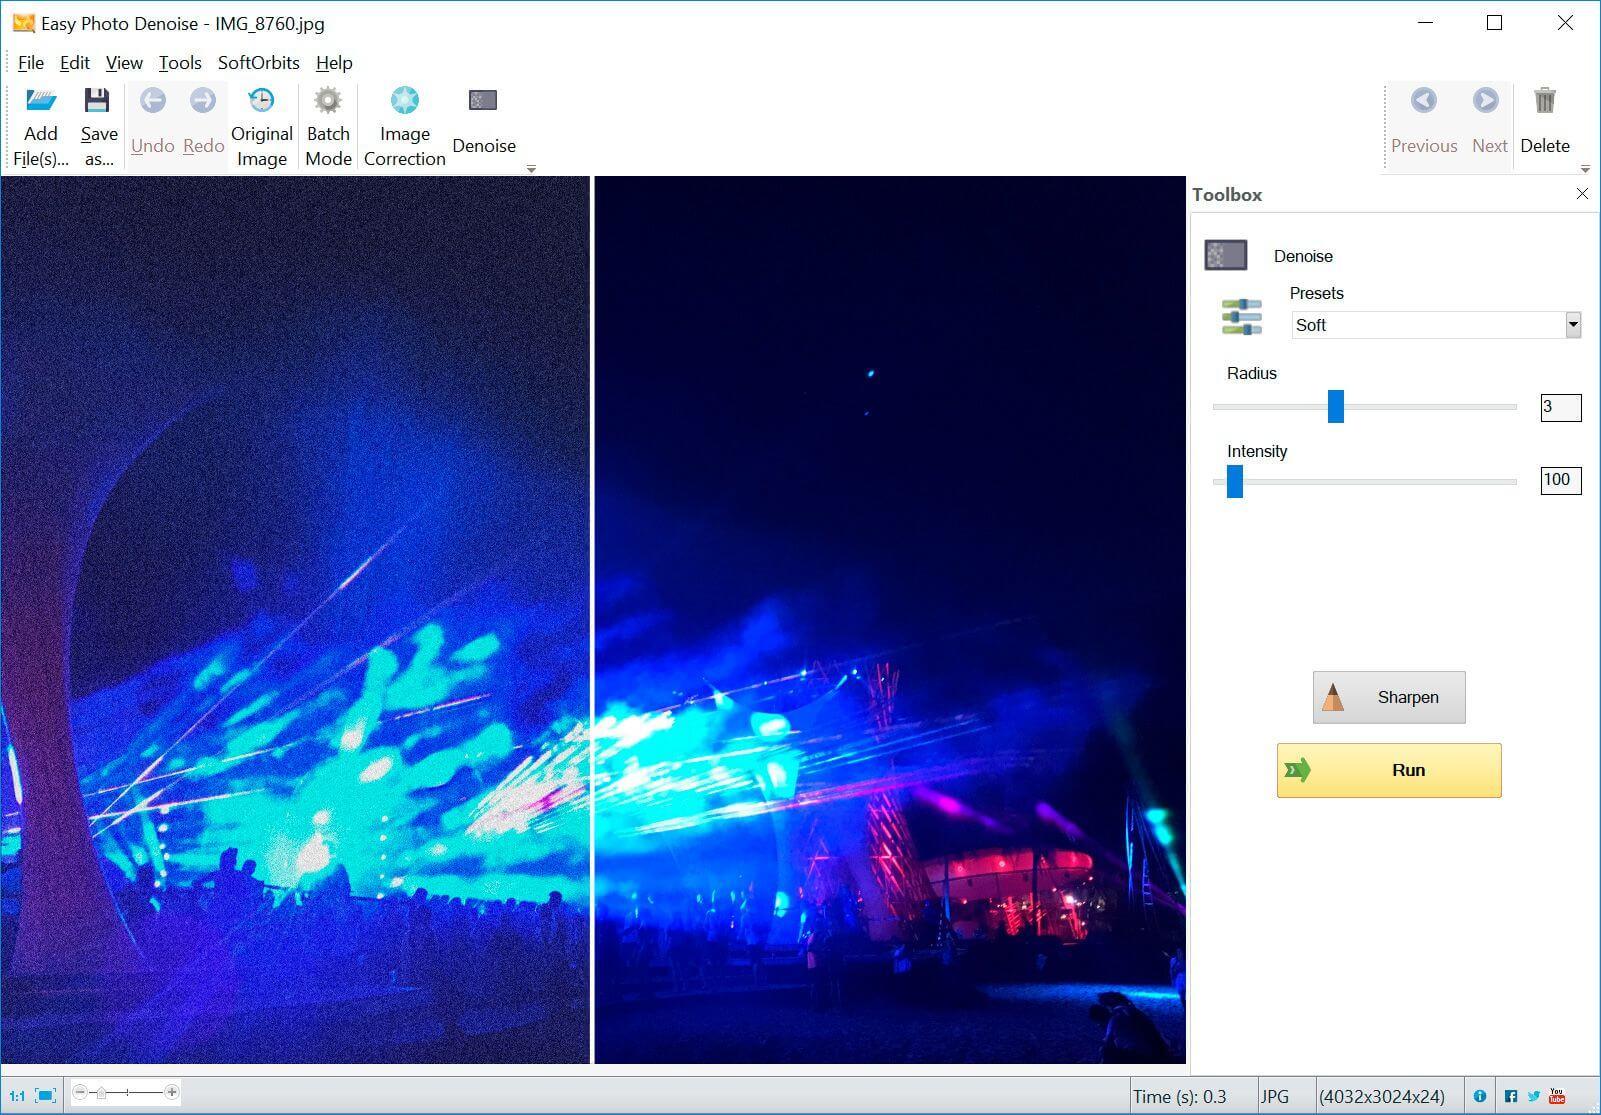 Easy Photo Denoise Screenshot